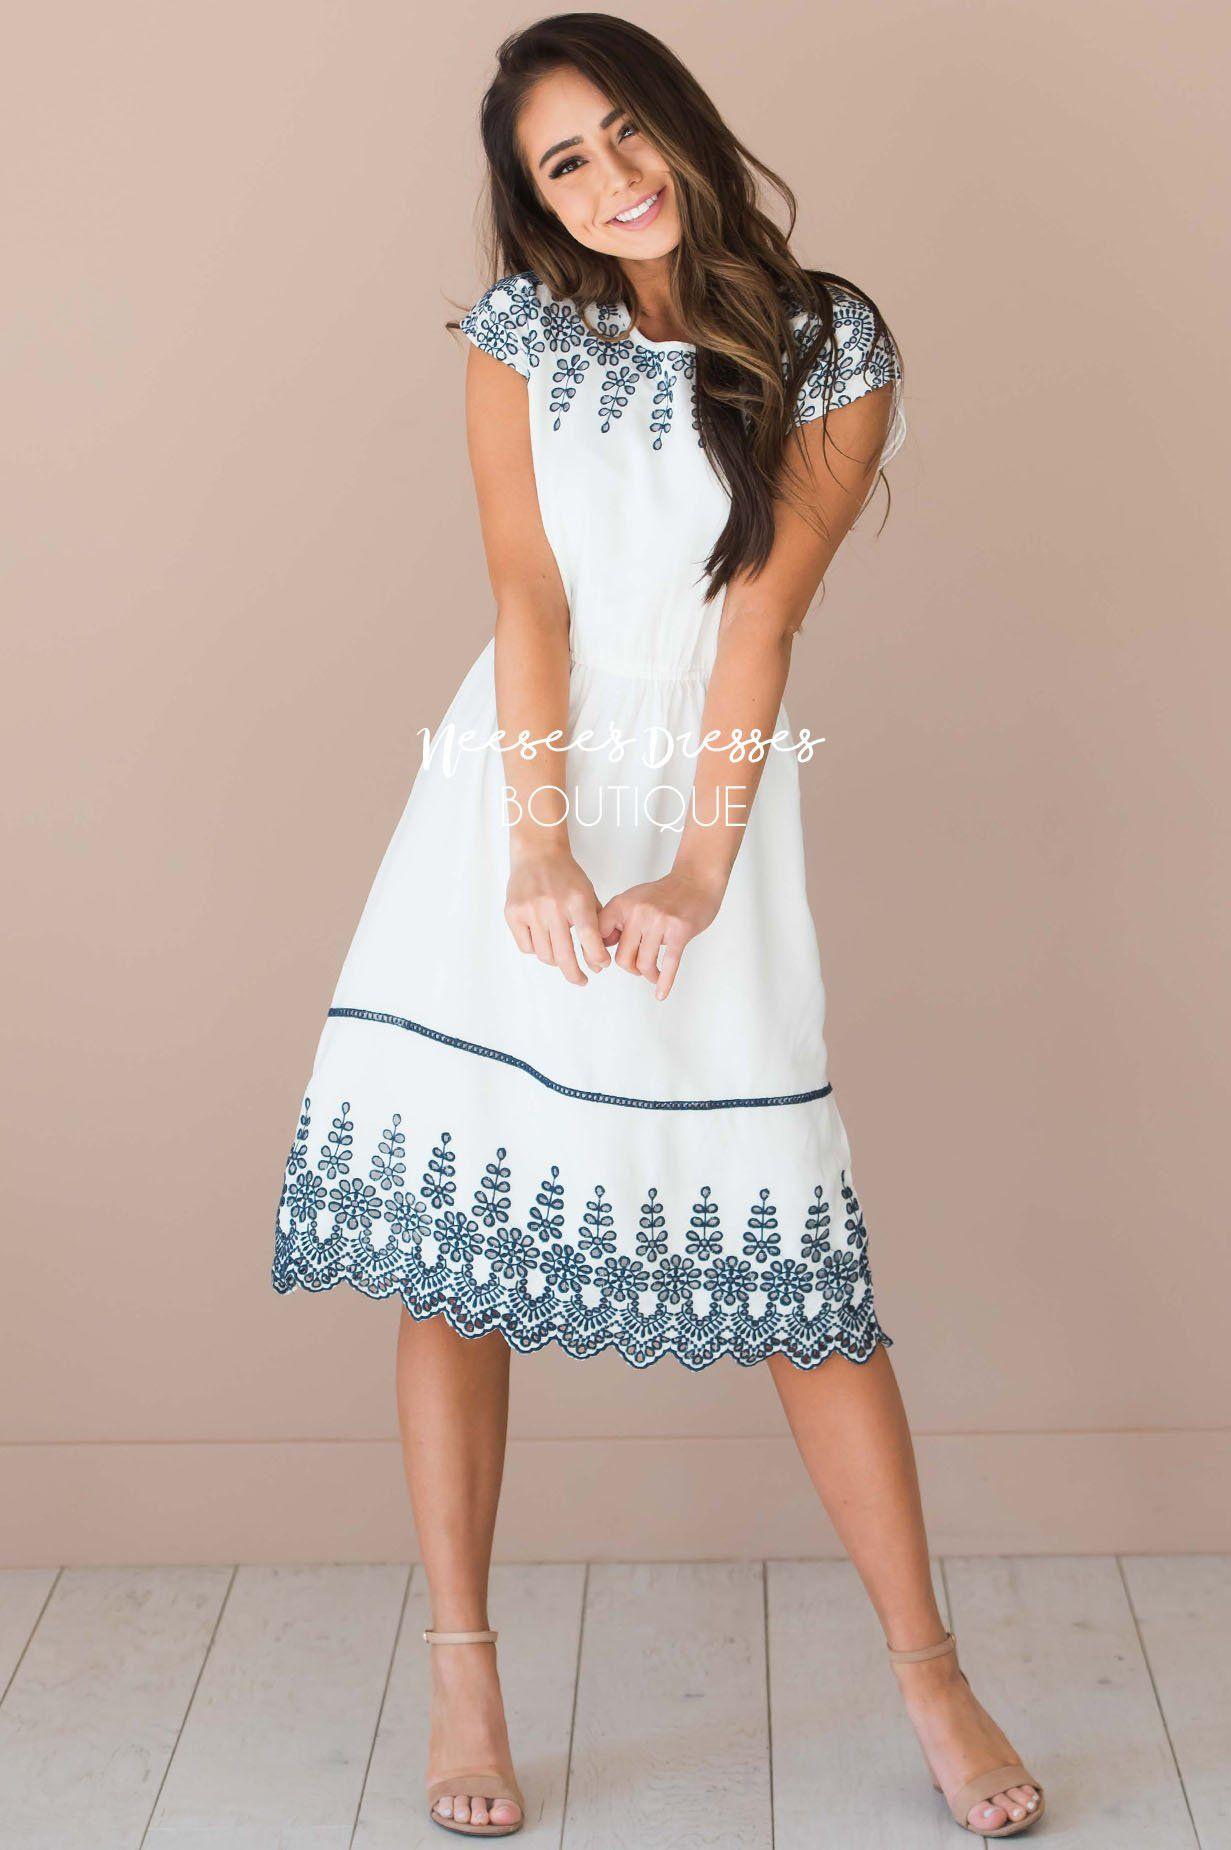 White Navy Eyelet Modest Dress Best Place To Buy Modest Dress Online Modest Dresses And Skirts For Chu Modest Summer Dresses Neesees Dresses Modest Dresses [ 1850 x 1231 Pixel ]